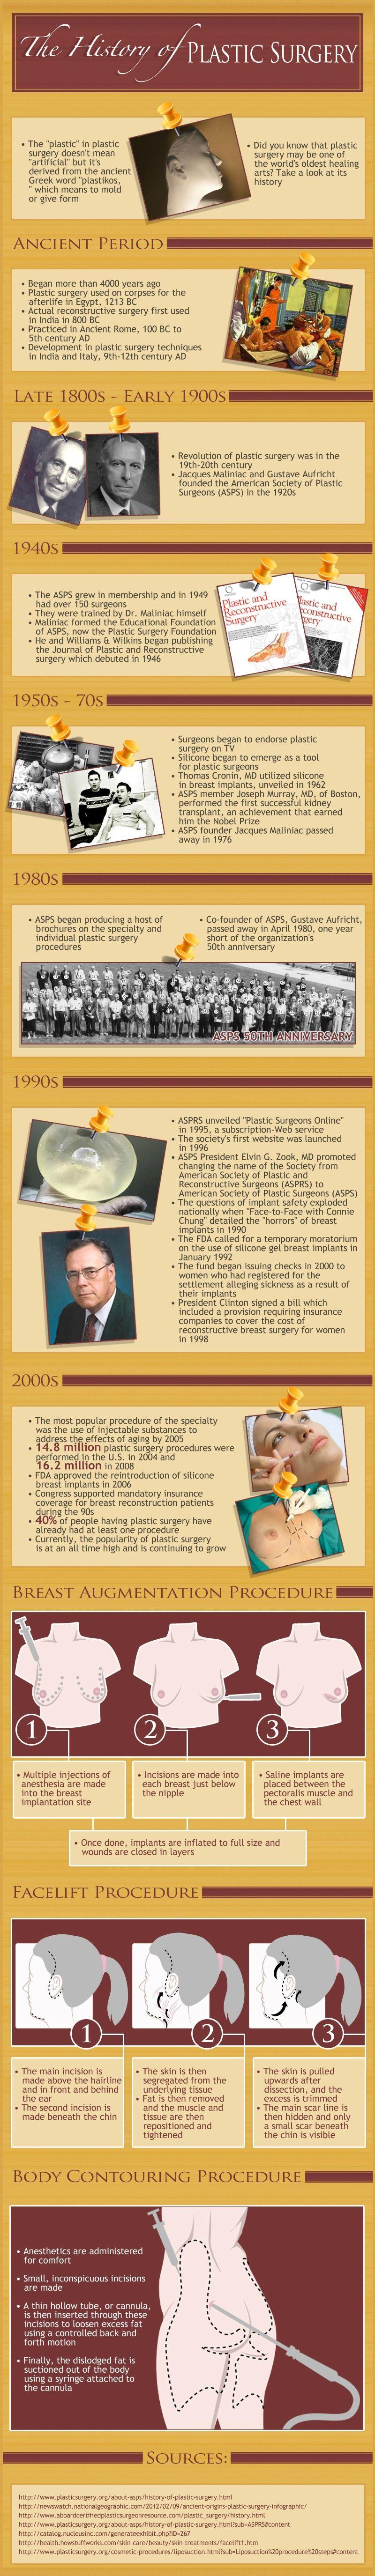 Alguna vez te has preguntado acerca de los origenes de la cirugia plastica? Aqui un poco de historia! #cirugiaplastica #infografias